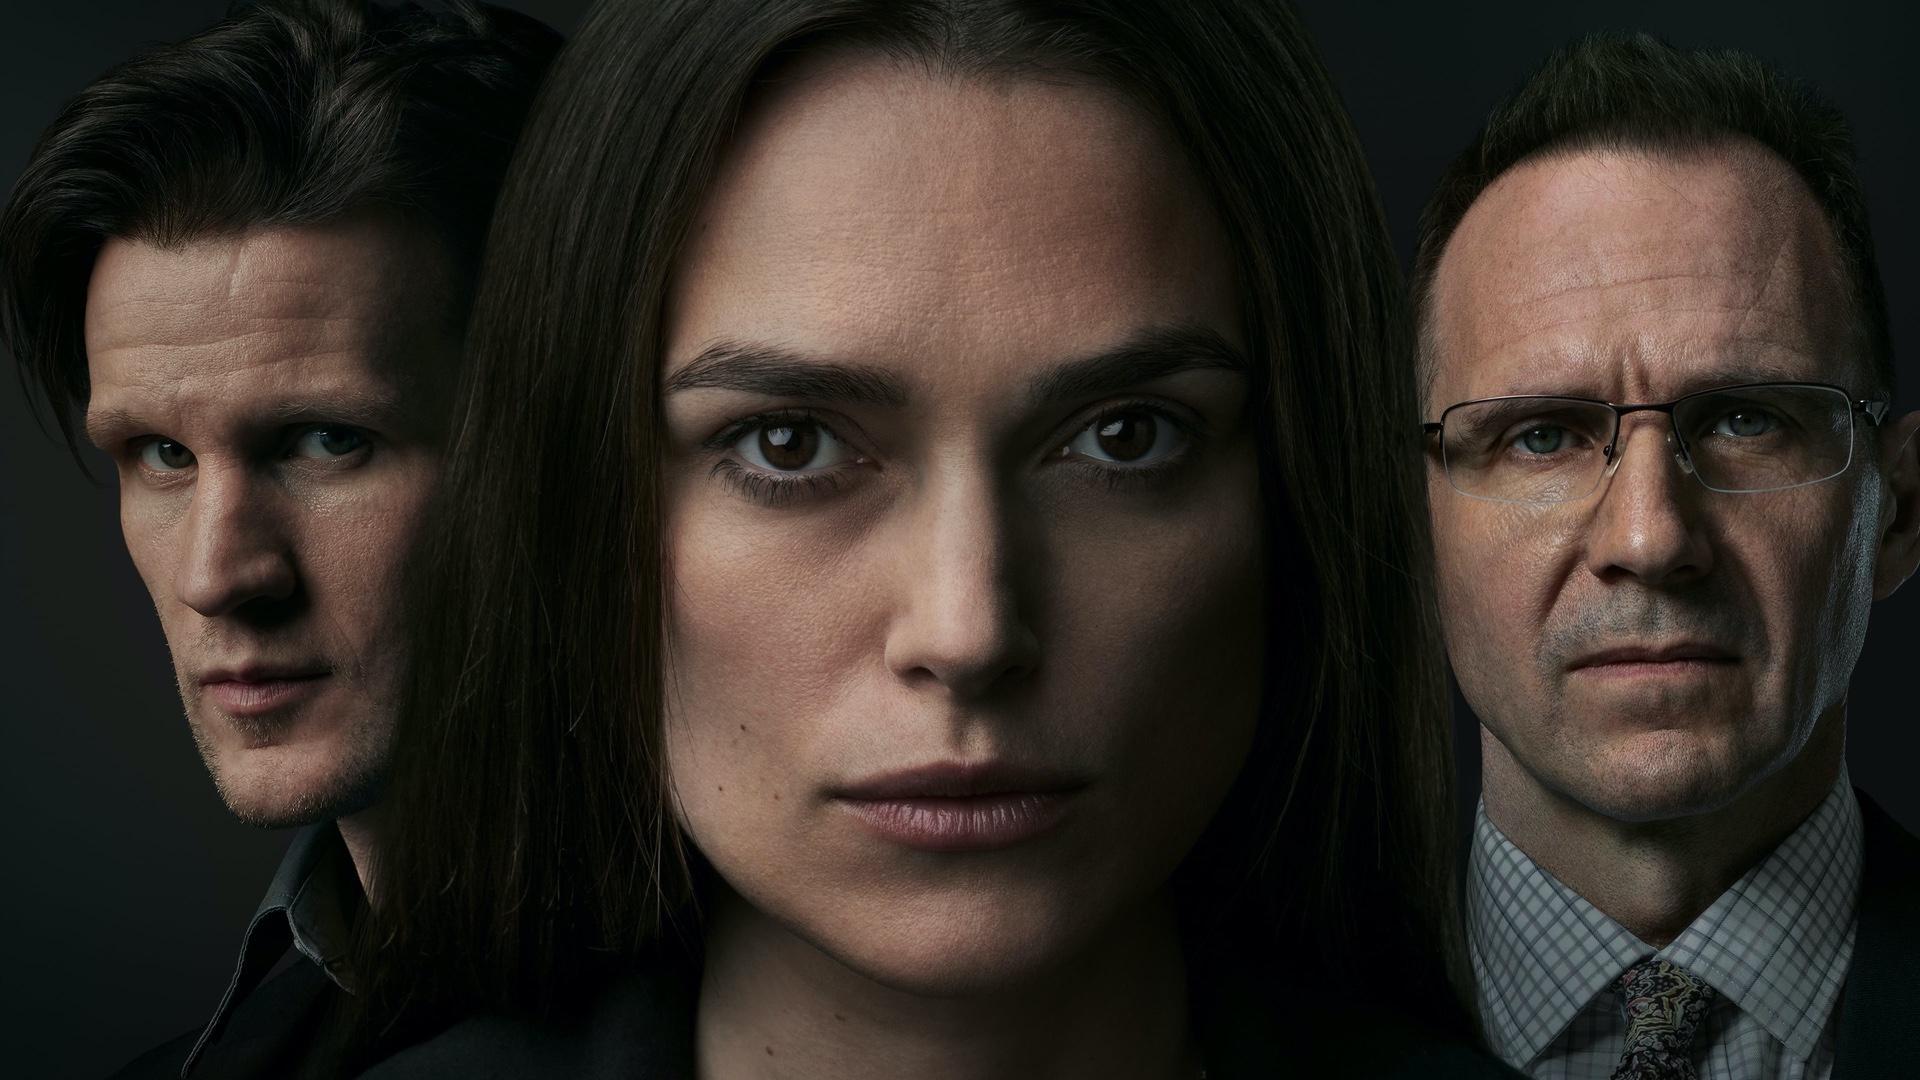 Venerdi 22 Gennaio 2021 Sky e Premium Cinema, Official Secrets - Segreto Di Stato